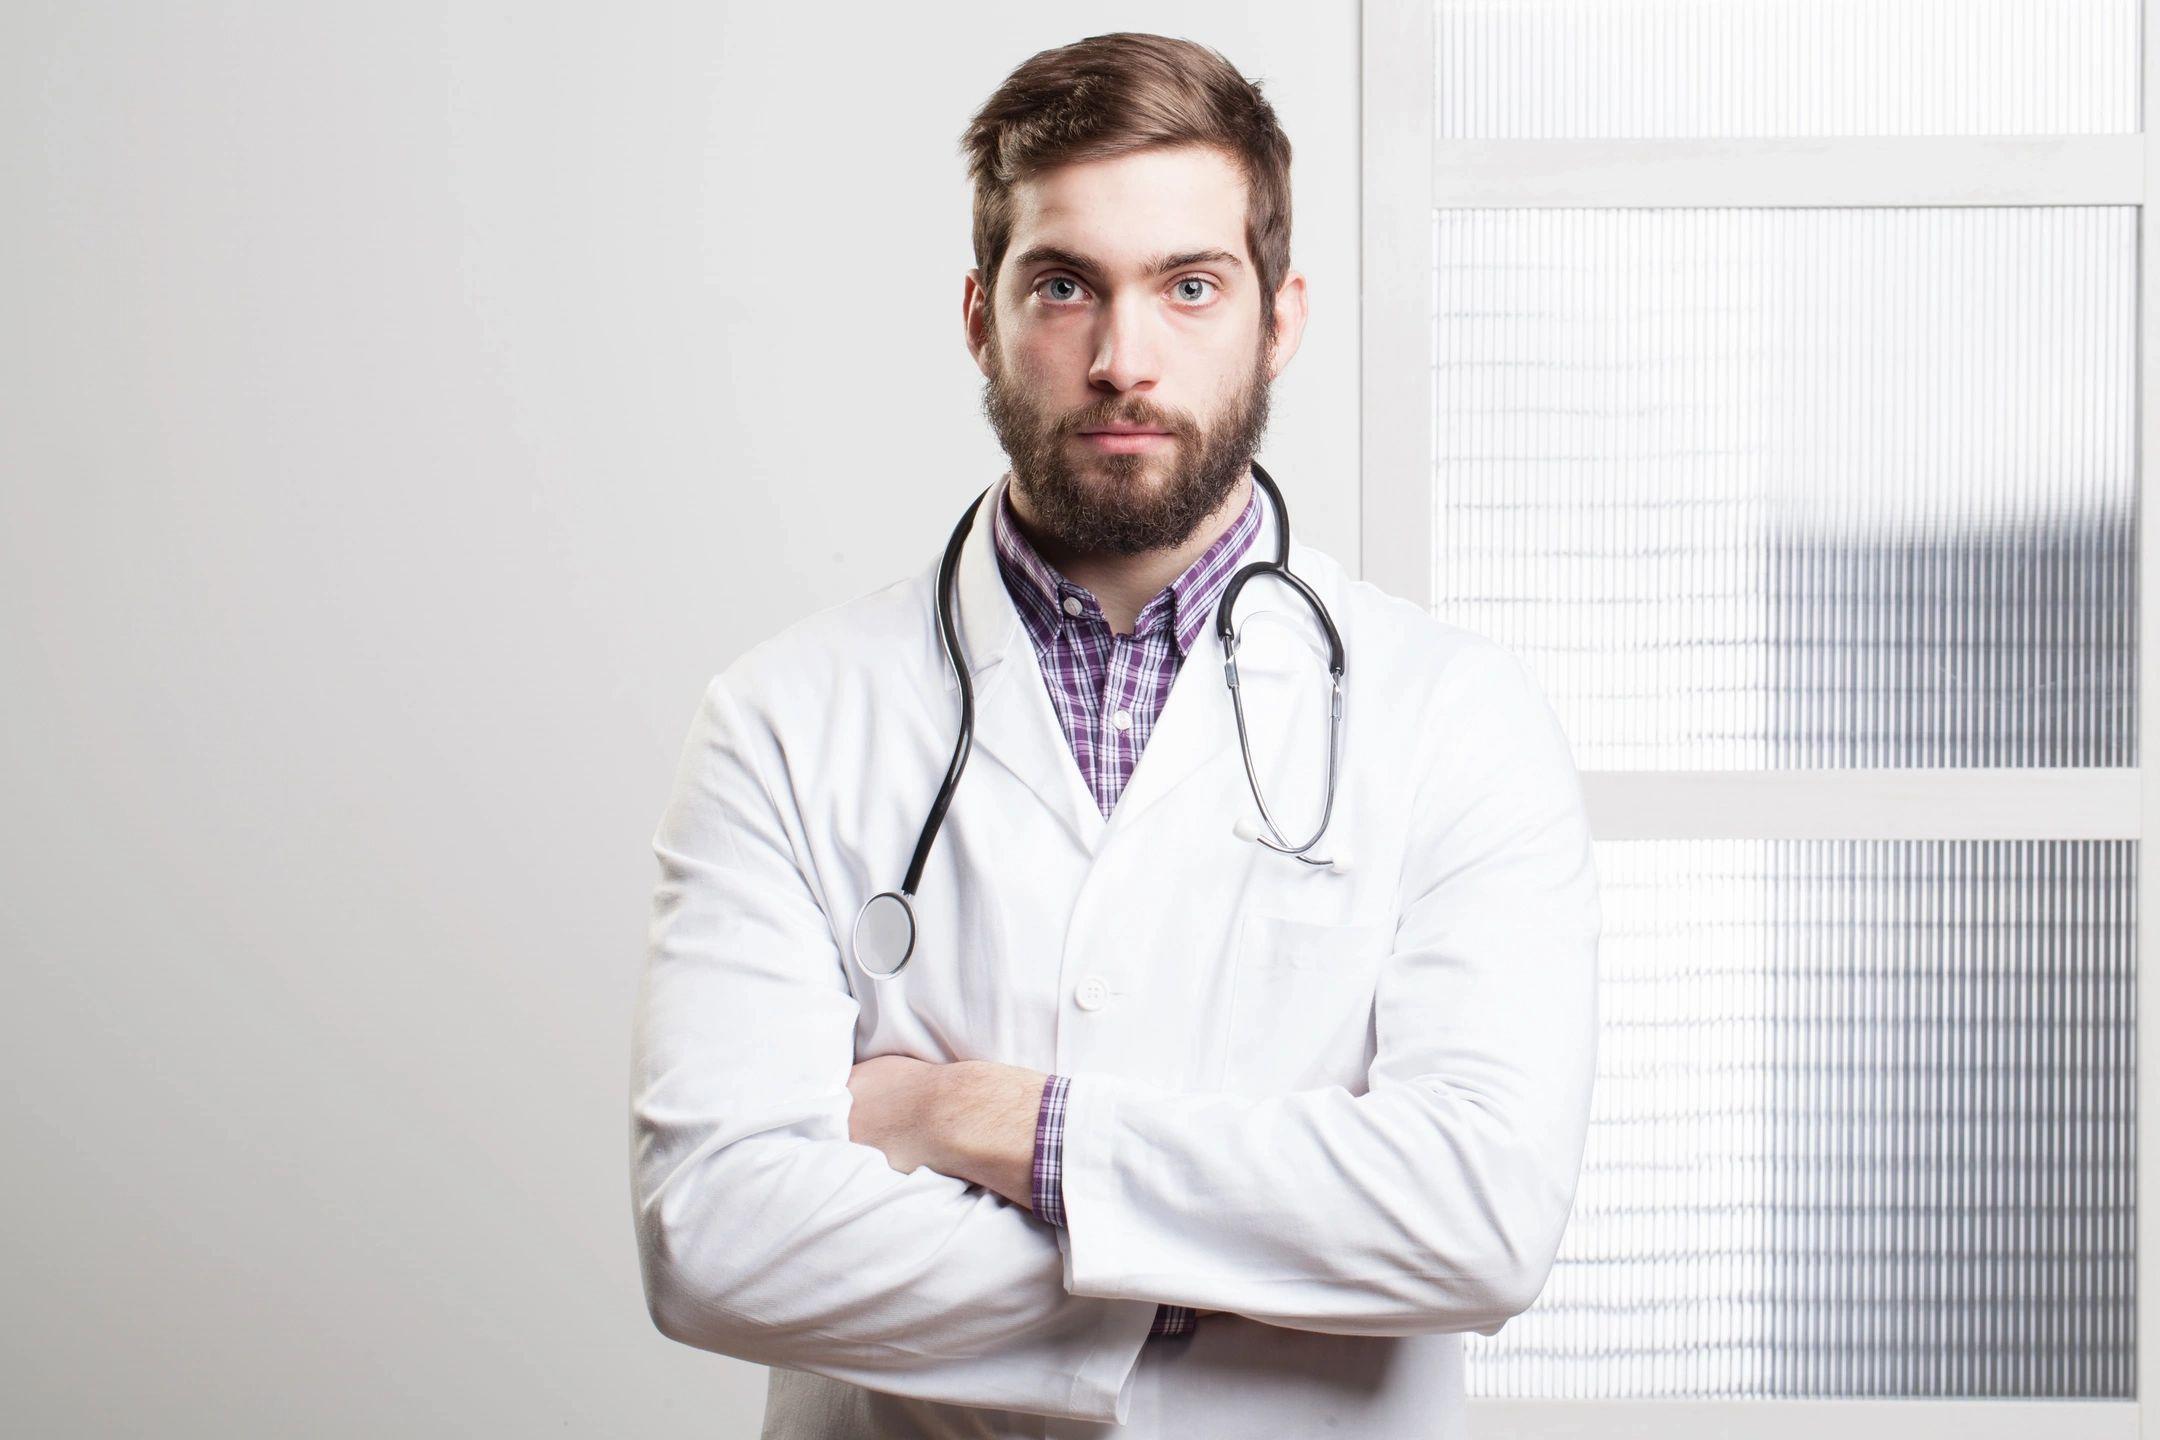 Medical marijuana card doctors Astoria Queens New York City